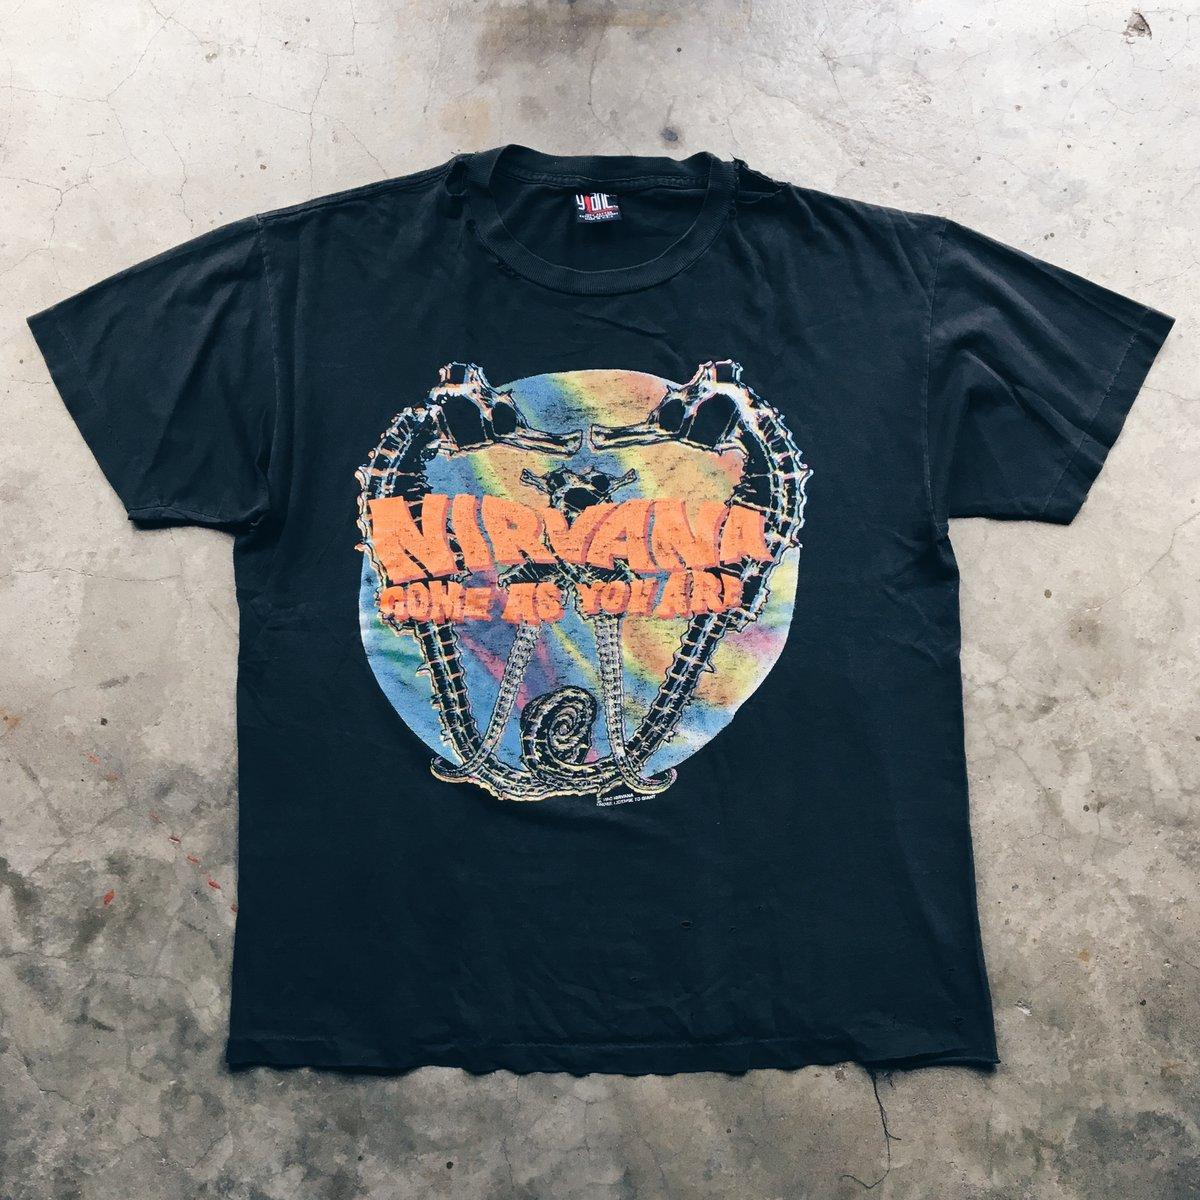 Image of Original 1992 Nirvana Come As You Are Tee.